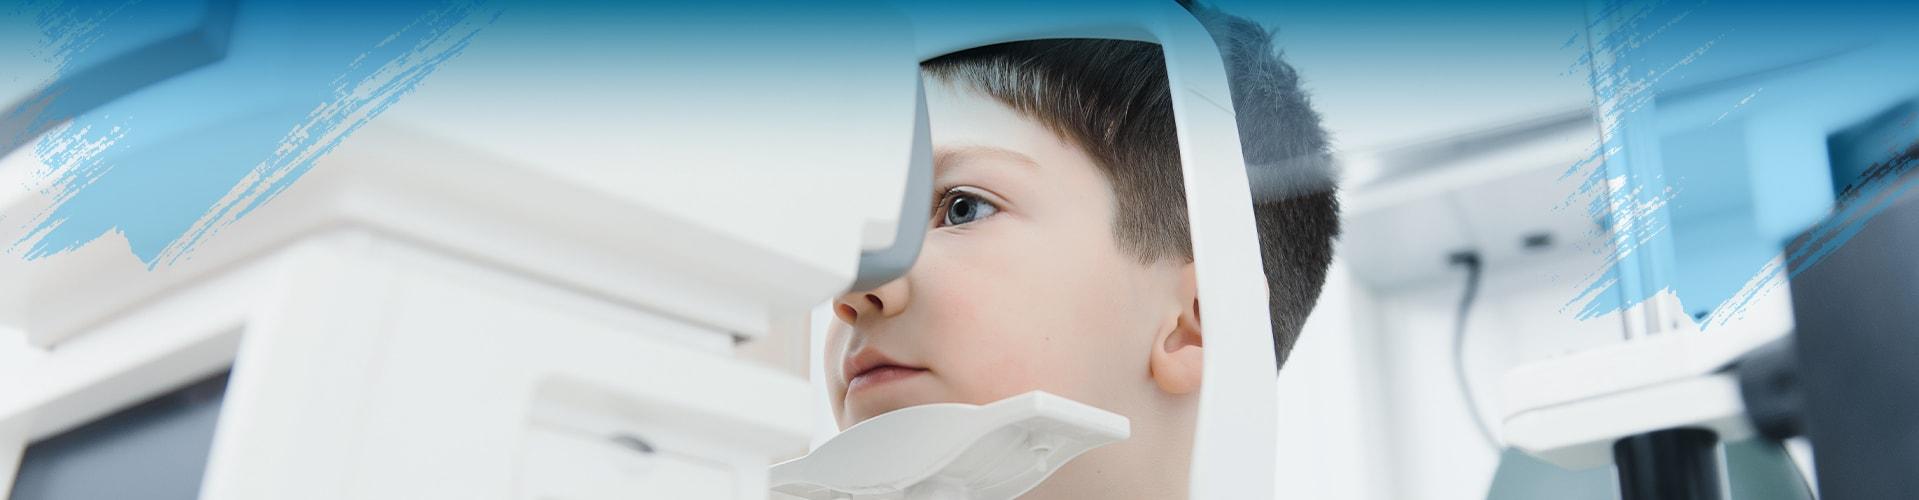 Children's Eye Exams